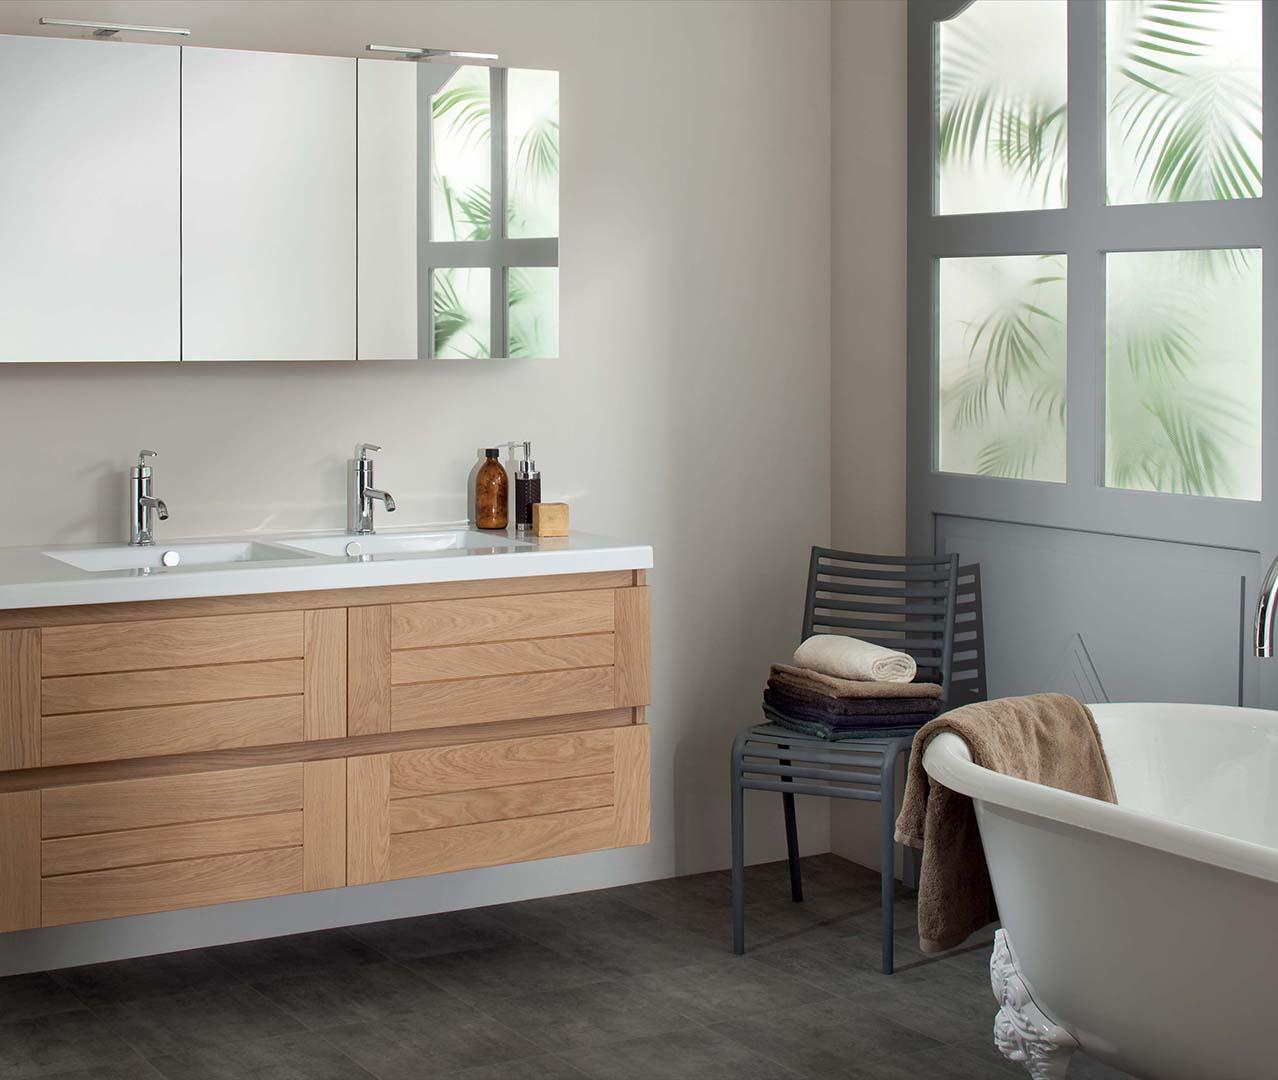 Gamme Lignum, meuble salle de bain bois - Sanijura